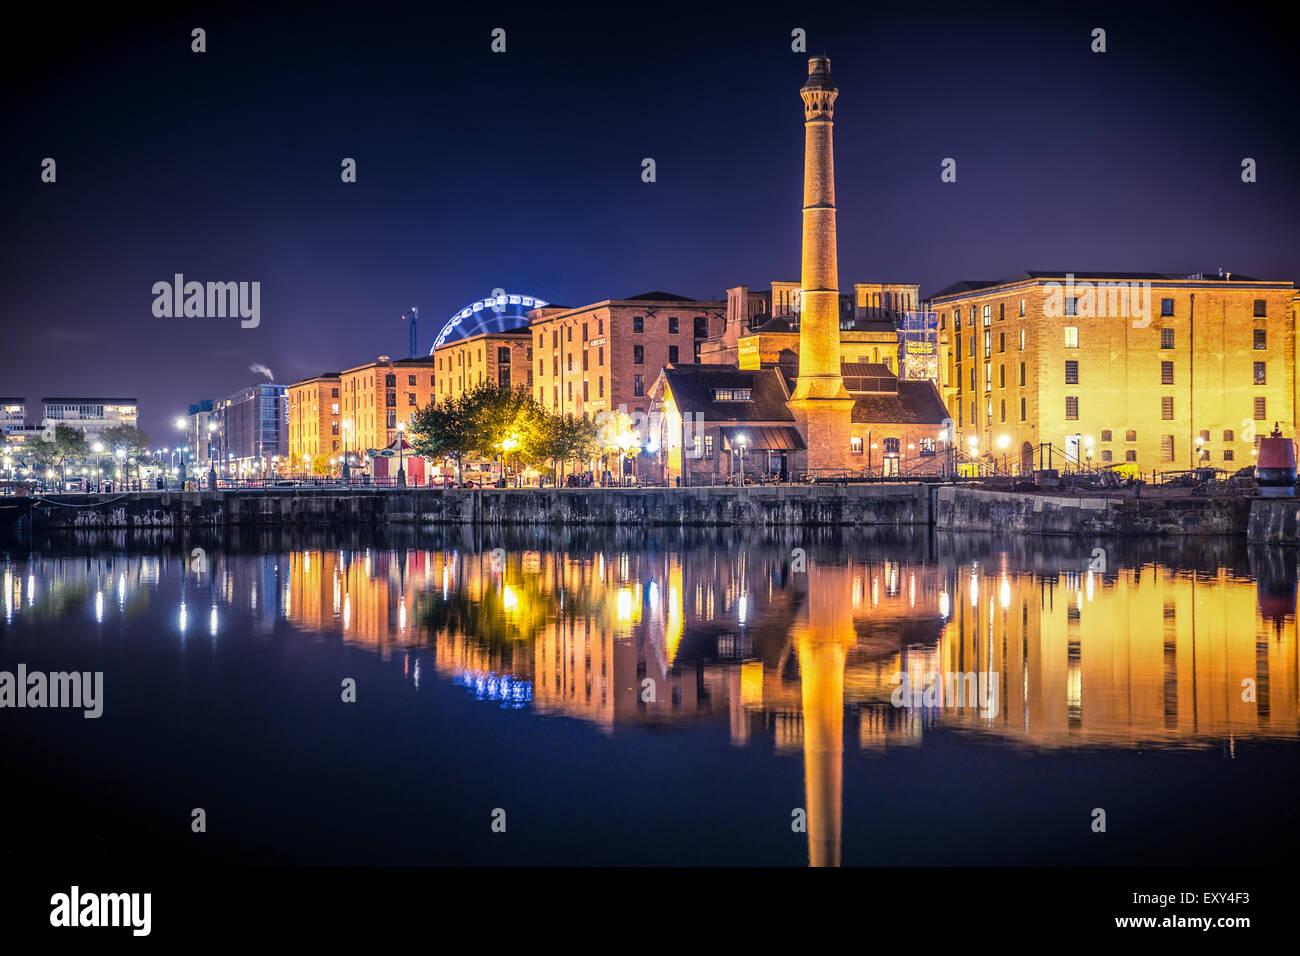 Liverpool United Kingdom waterfront skyline at night - Stock Image